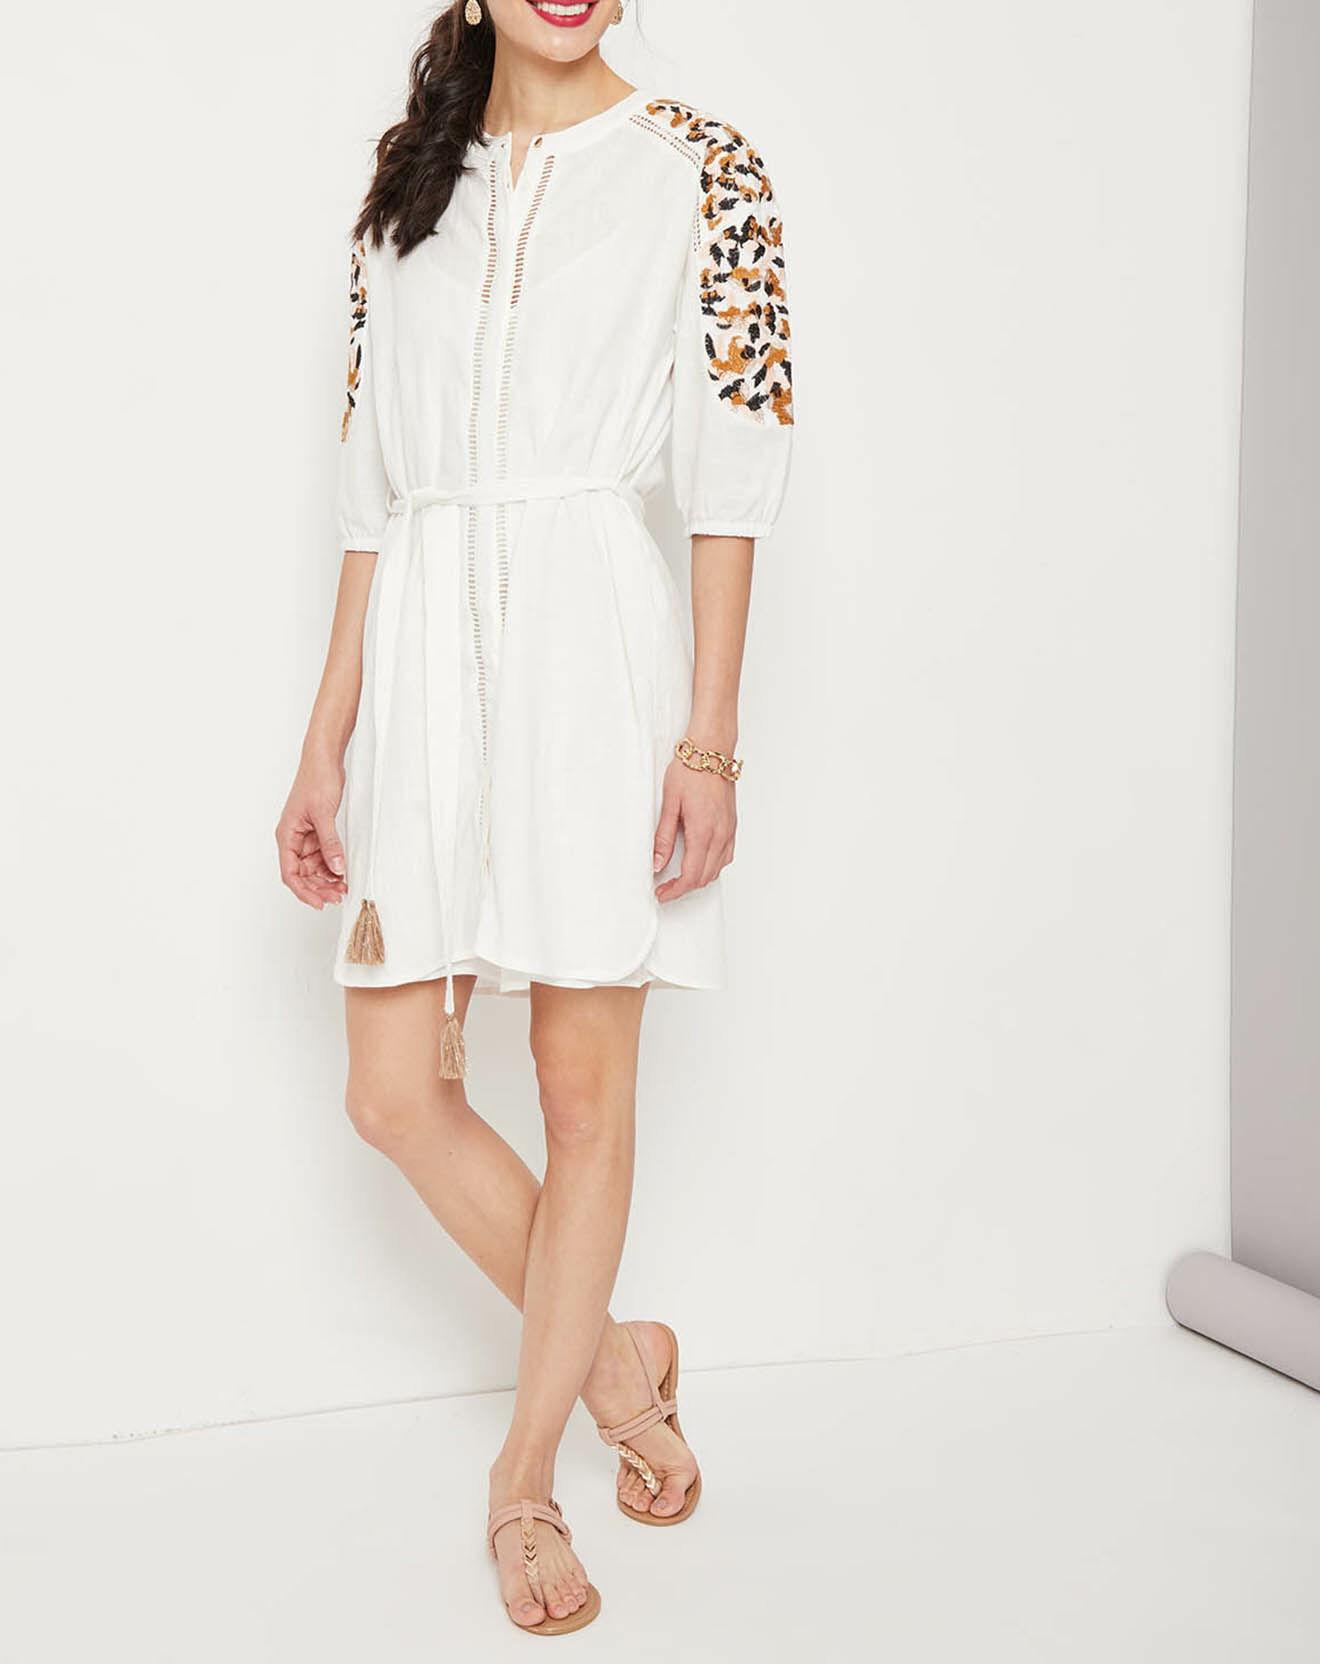 Robe Chataigne brodée blanc cassé - Suncoo - Modalova